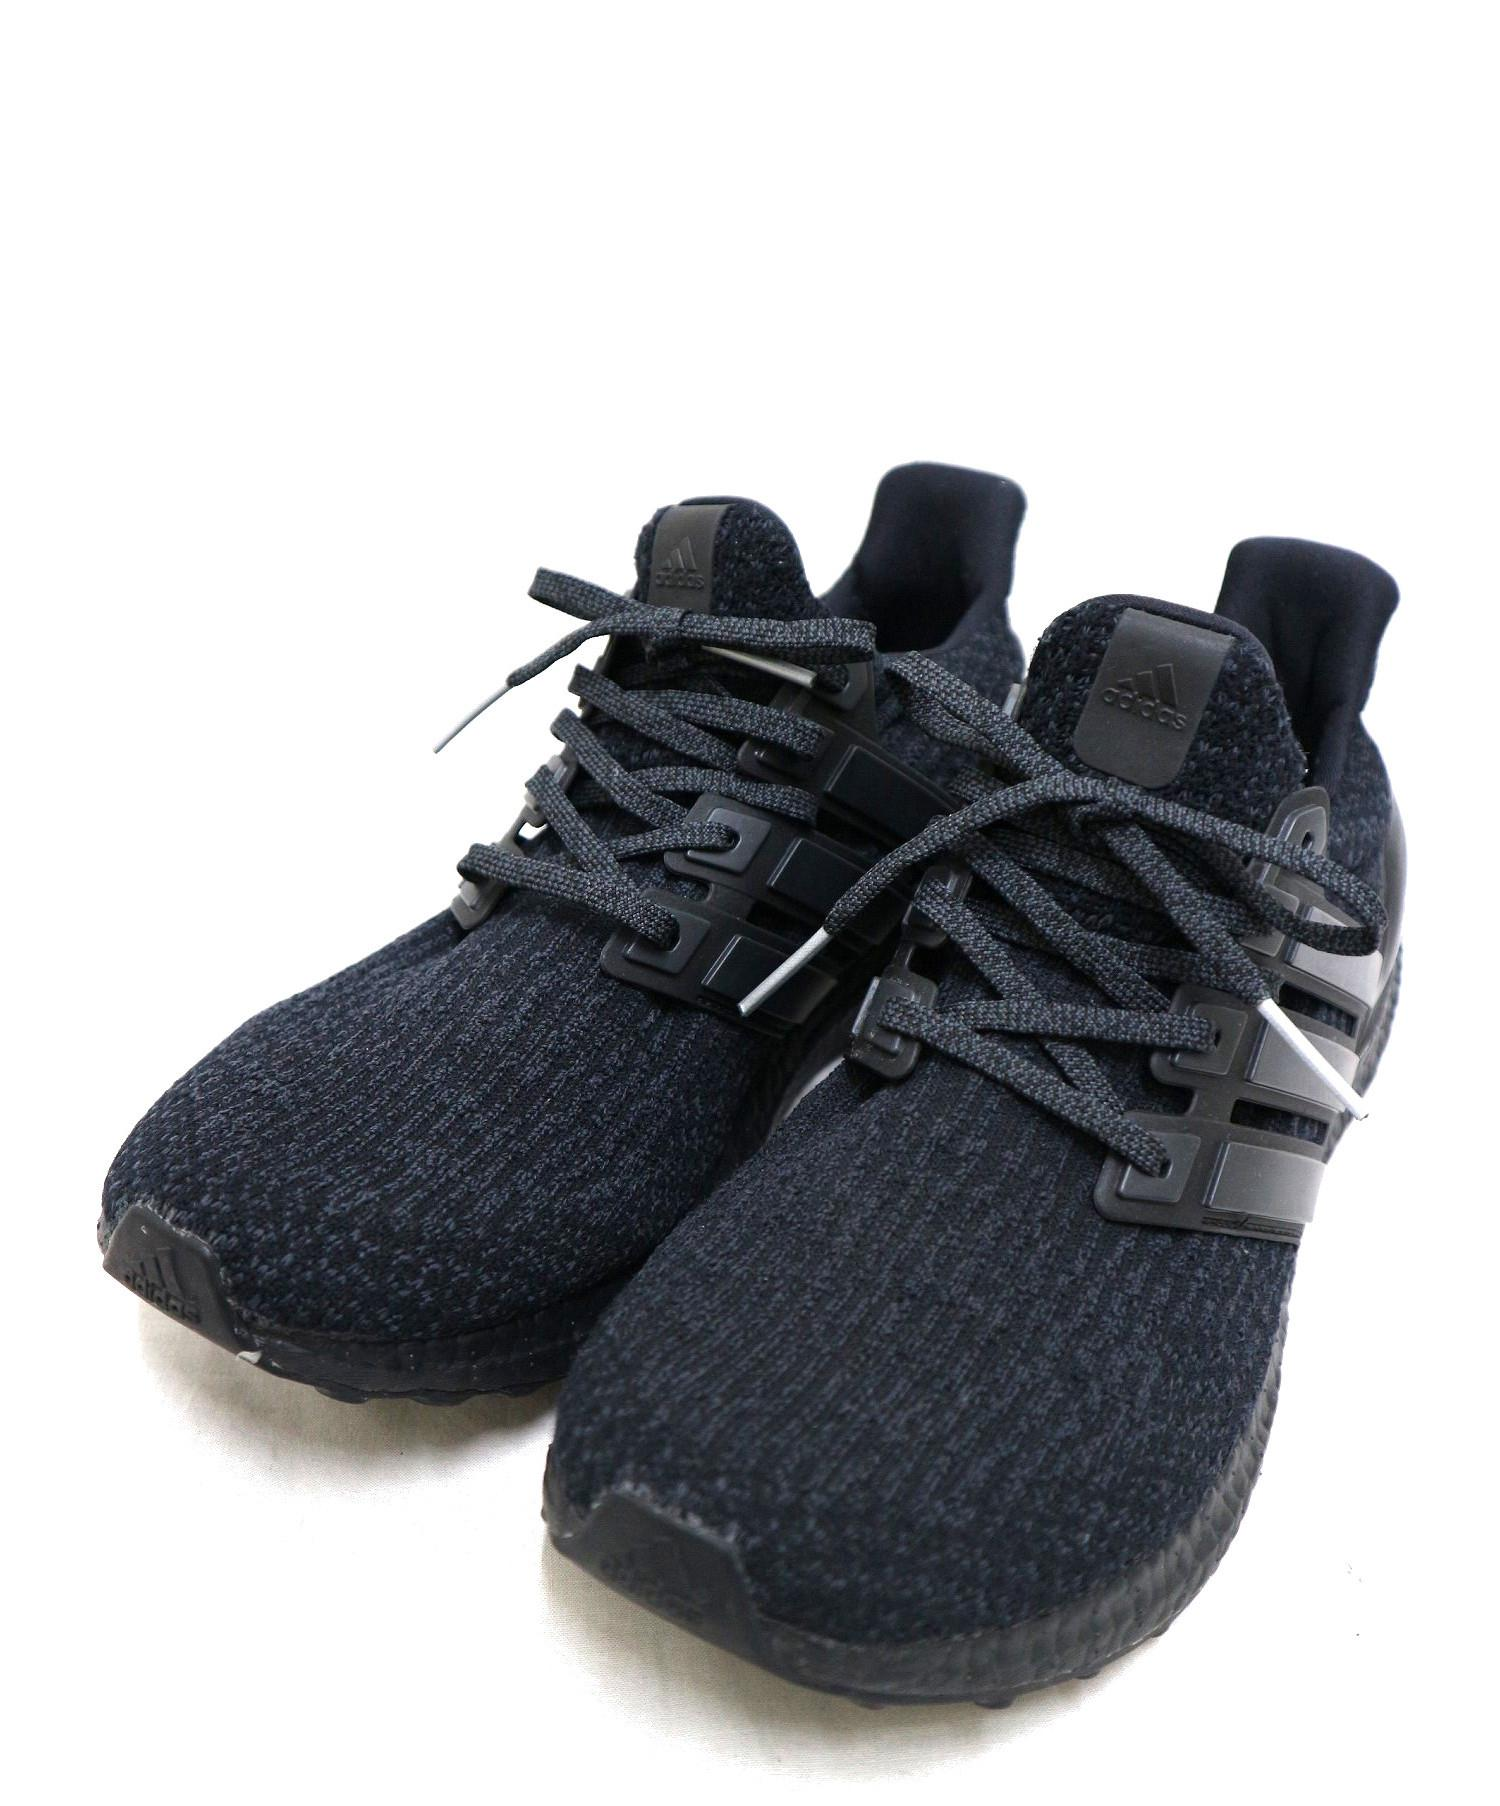 best sneakers b4828 ad1b6 [中古]adidas(アディダス)のメンズ シューズ Ultra Boost 3.0